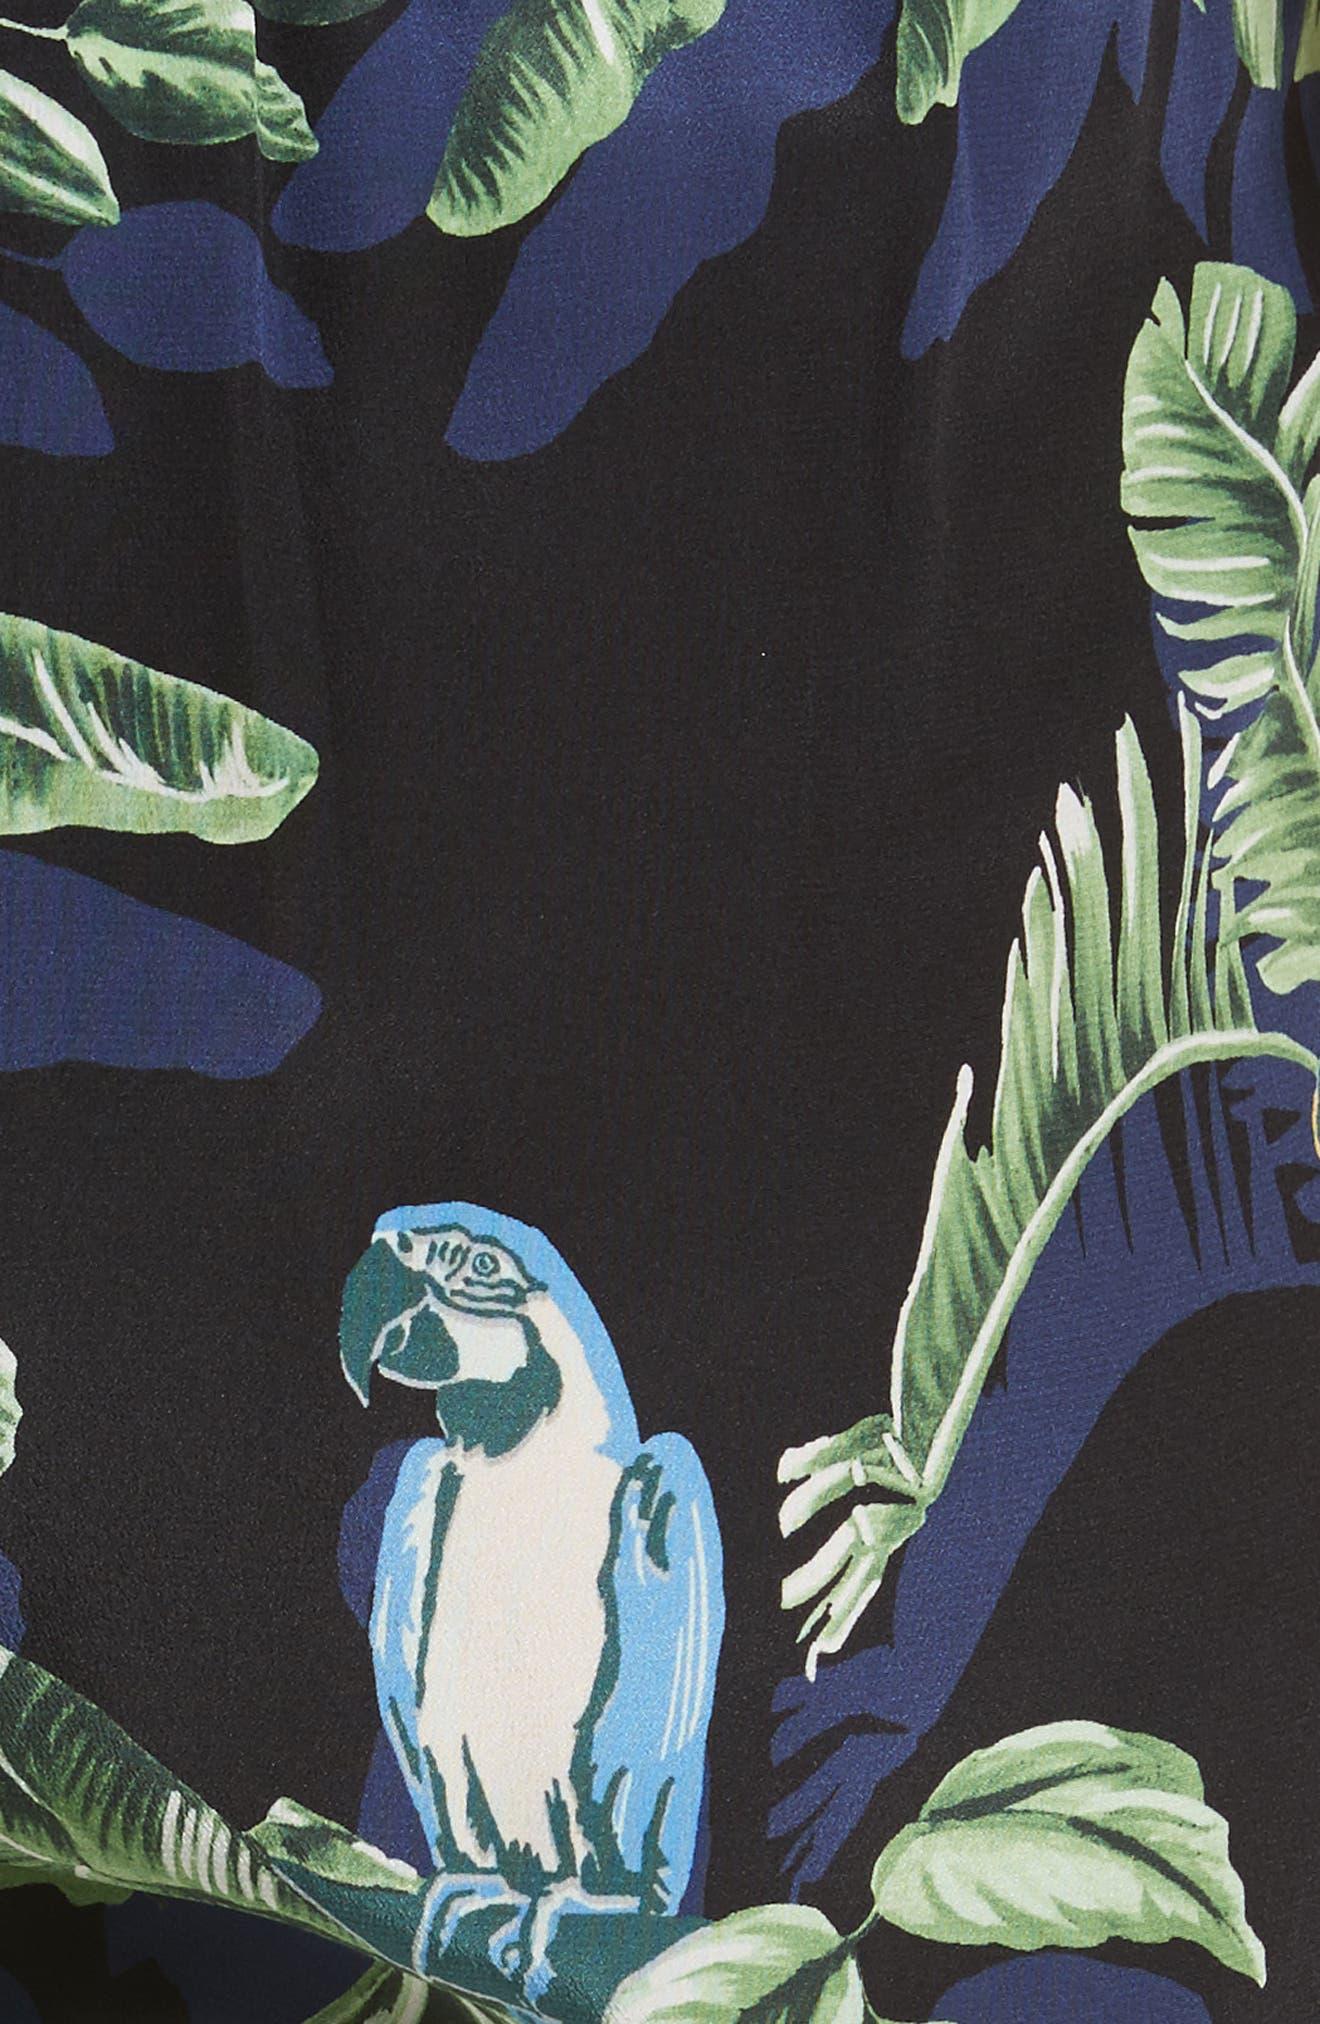 Birds of Paradise Silk Crêpe de Chine Pants,                             Alternate thumbnail 5, color,                             001